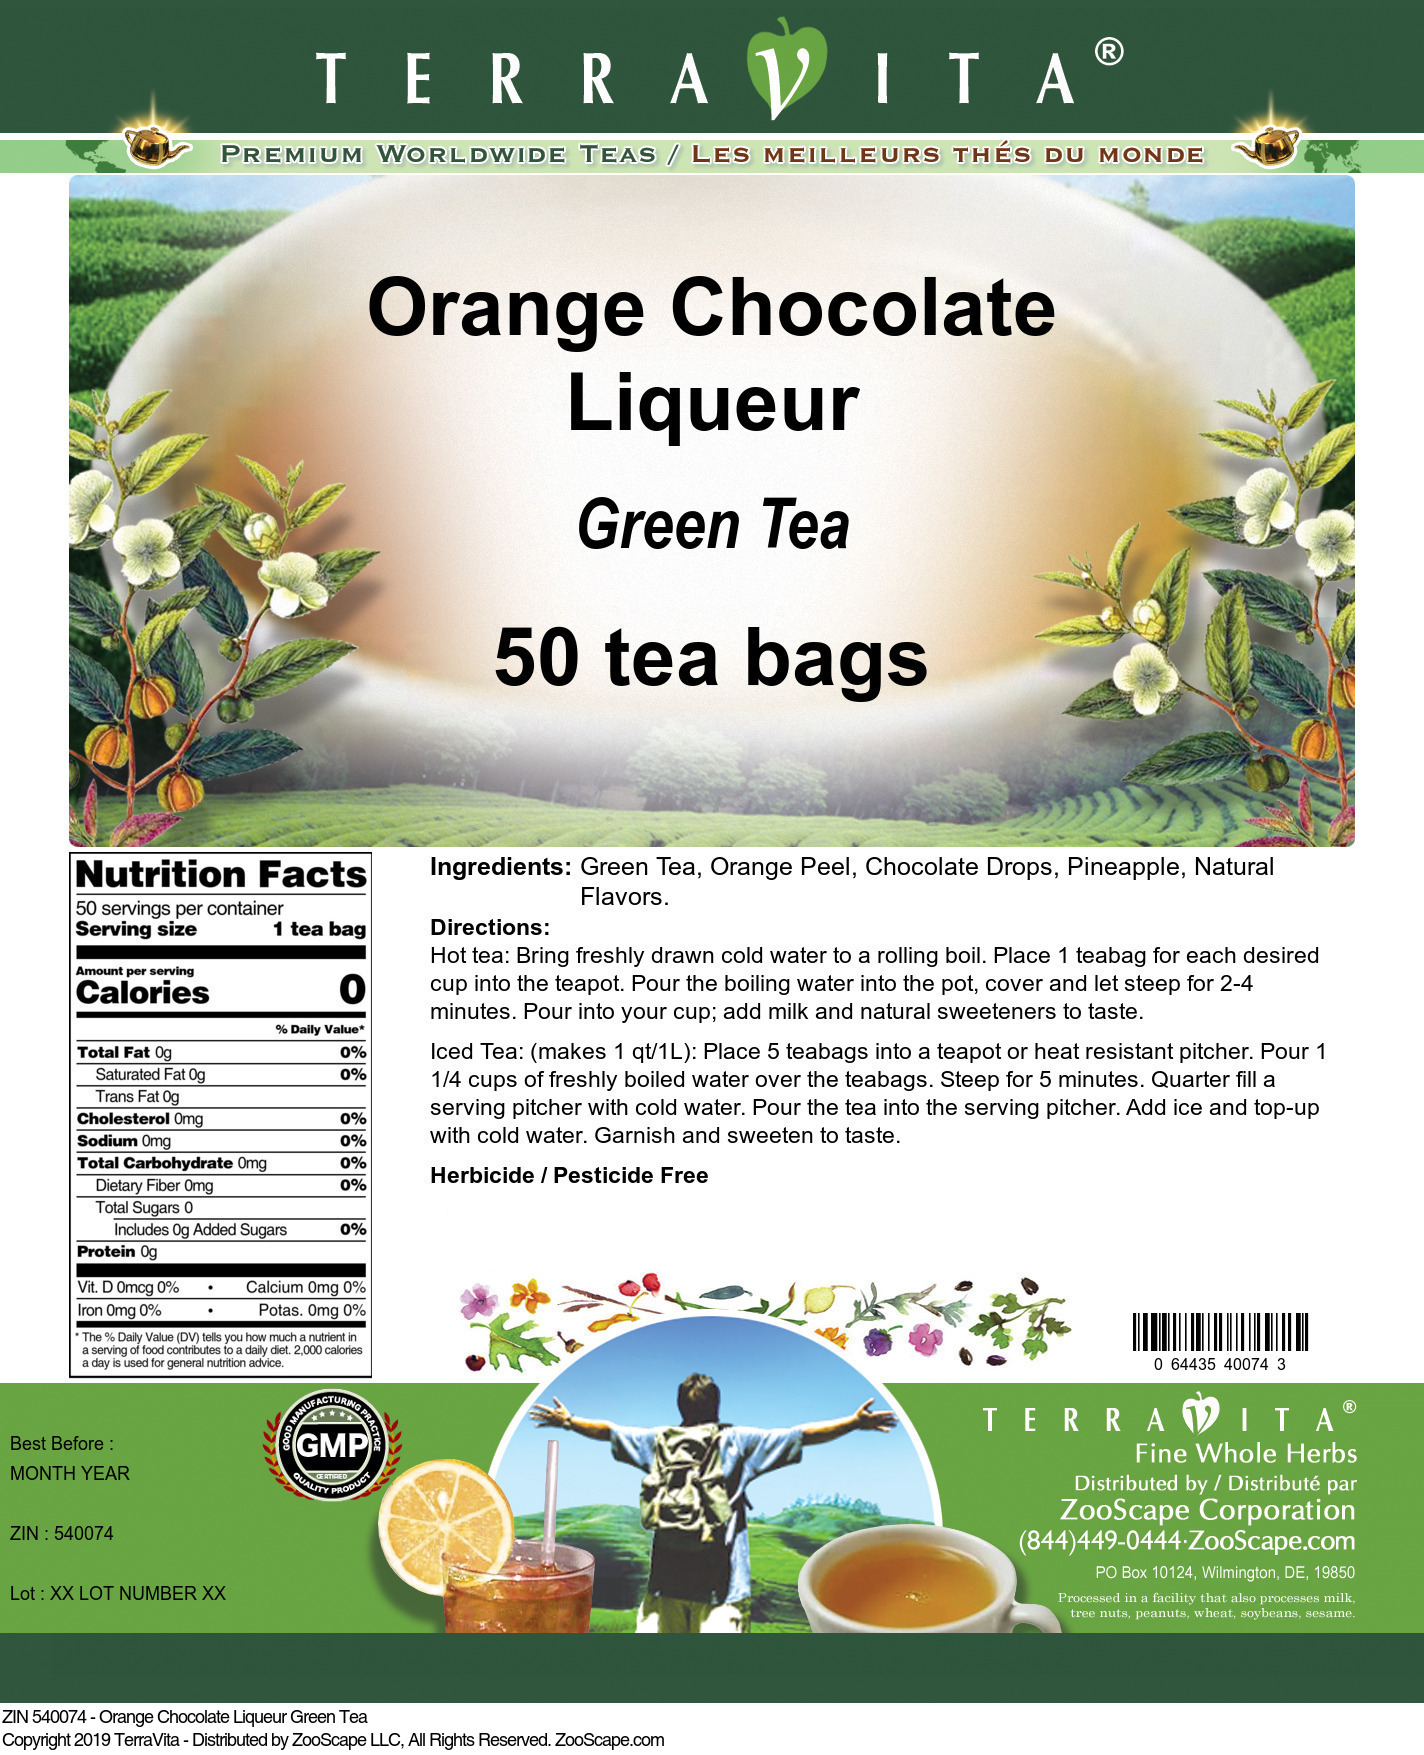 Orange Chocolate Liqueur Green Tea